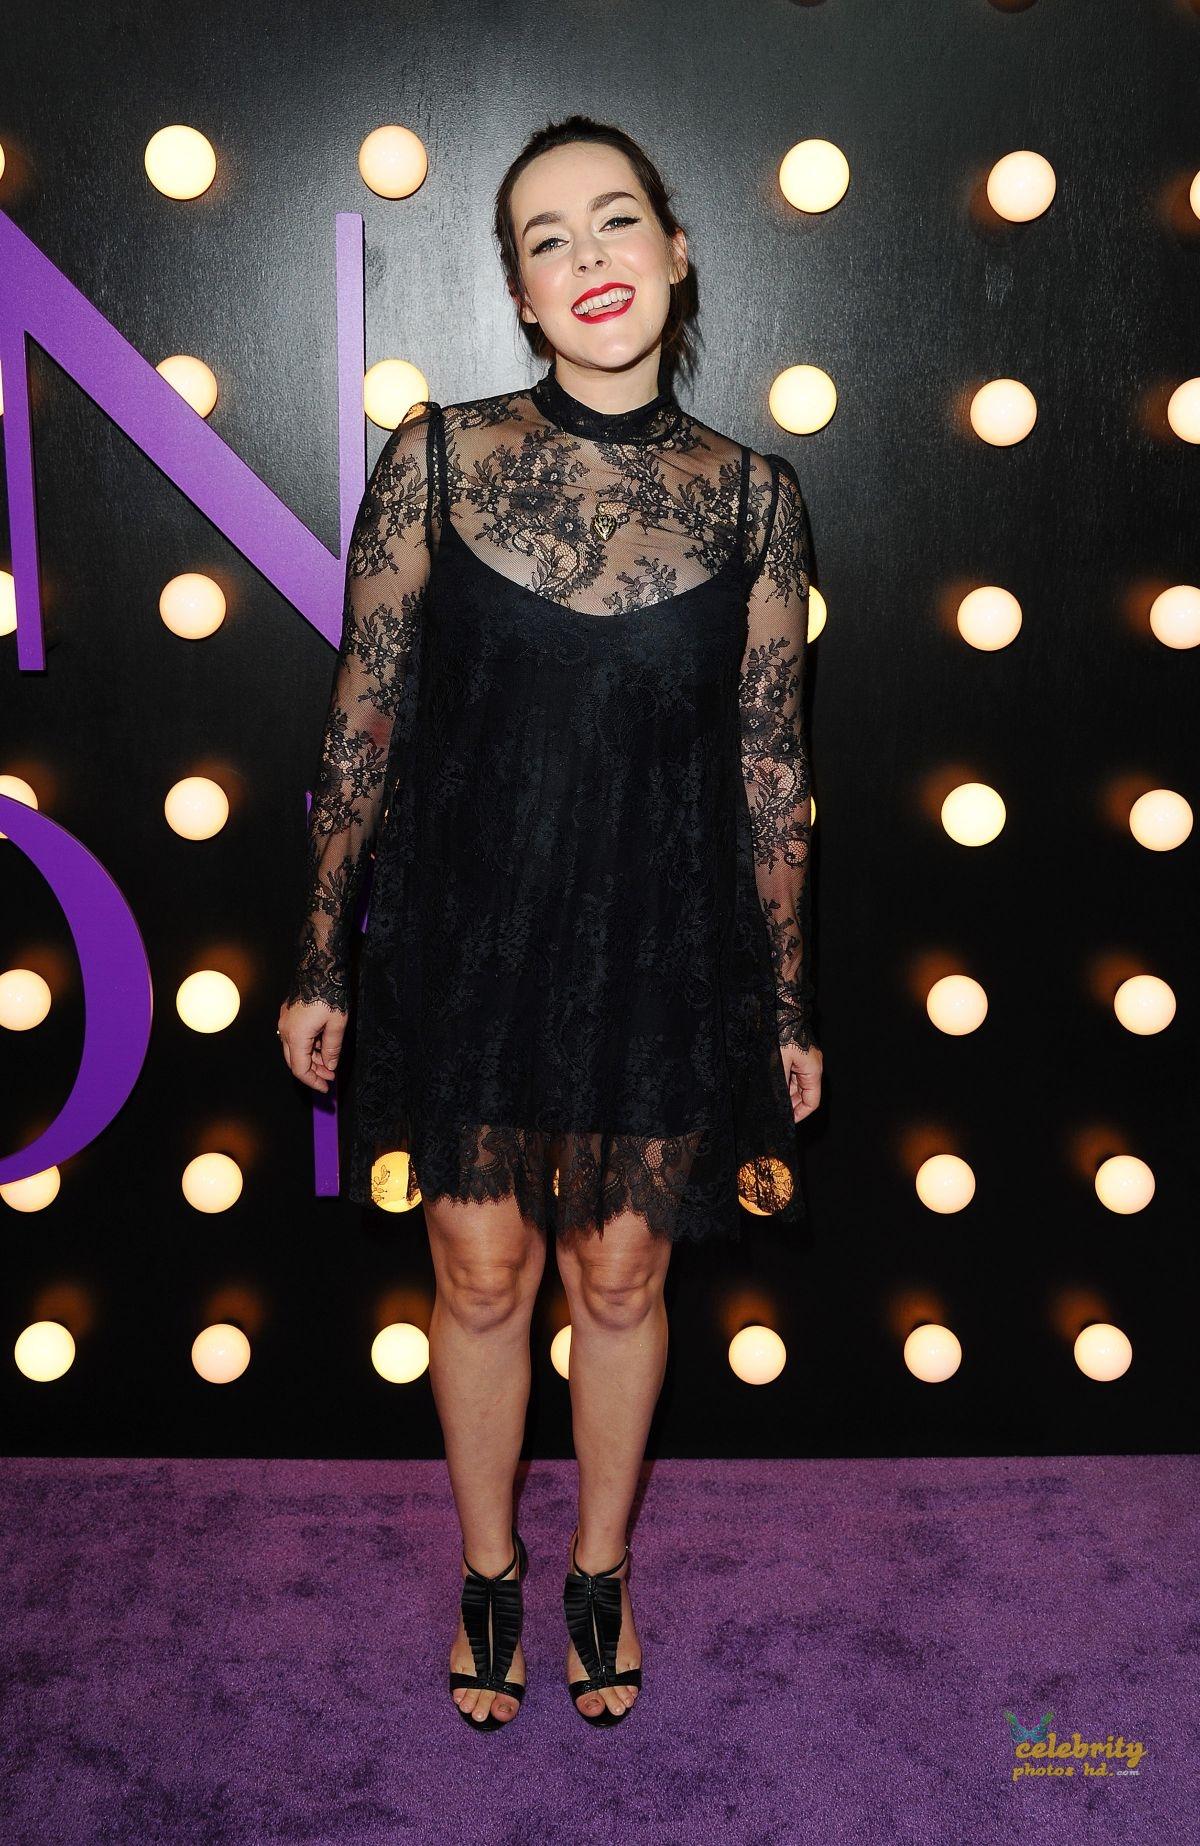 JENA MALONE at 'The Neon Demon' Premiere in Los Angeles (5)